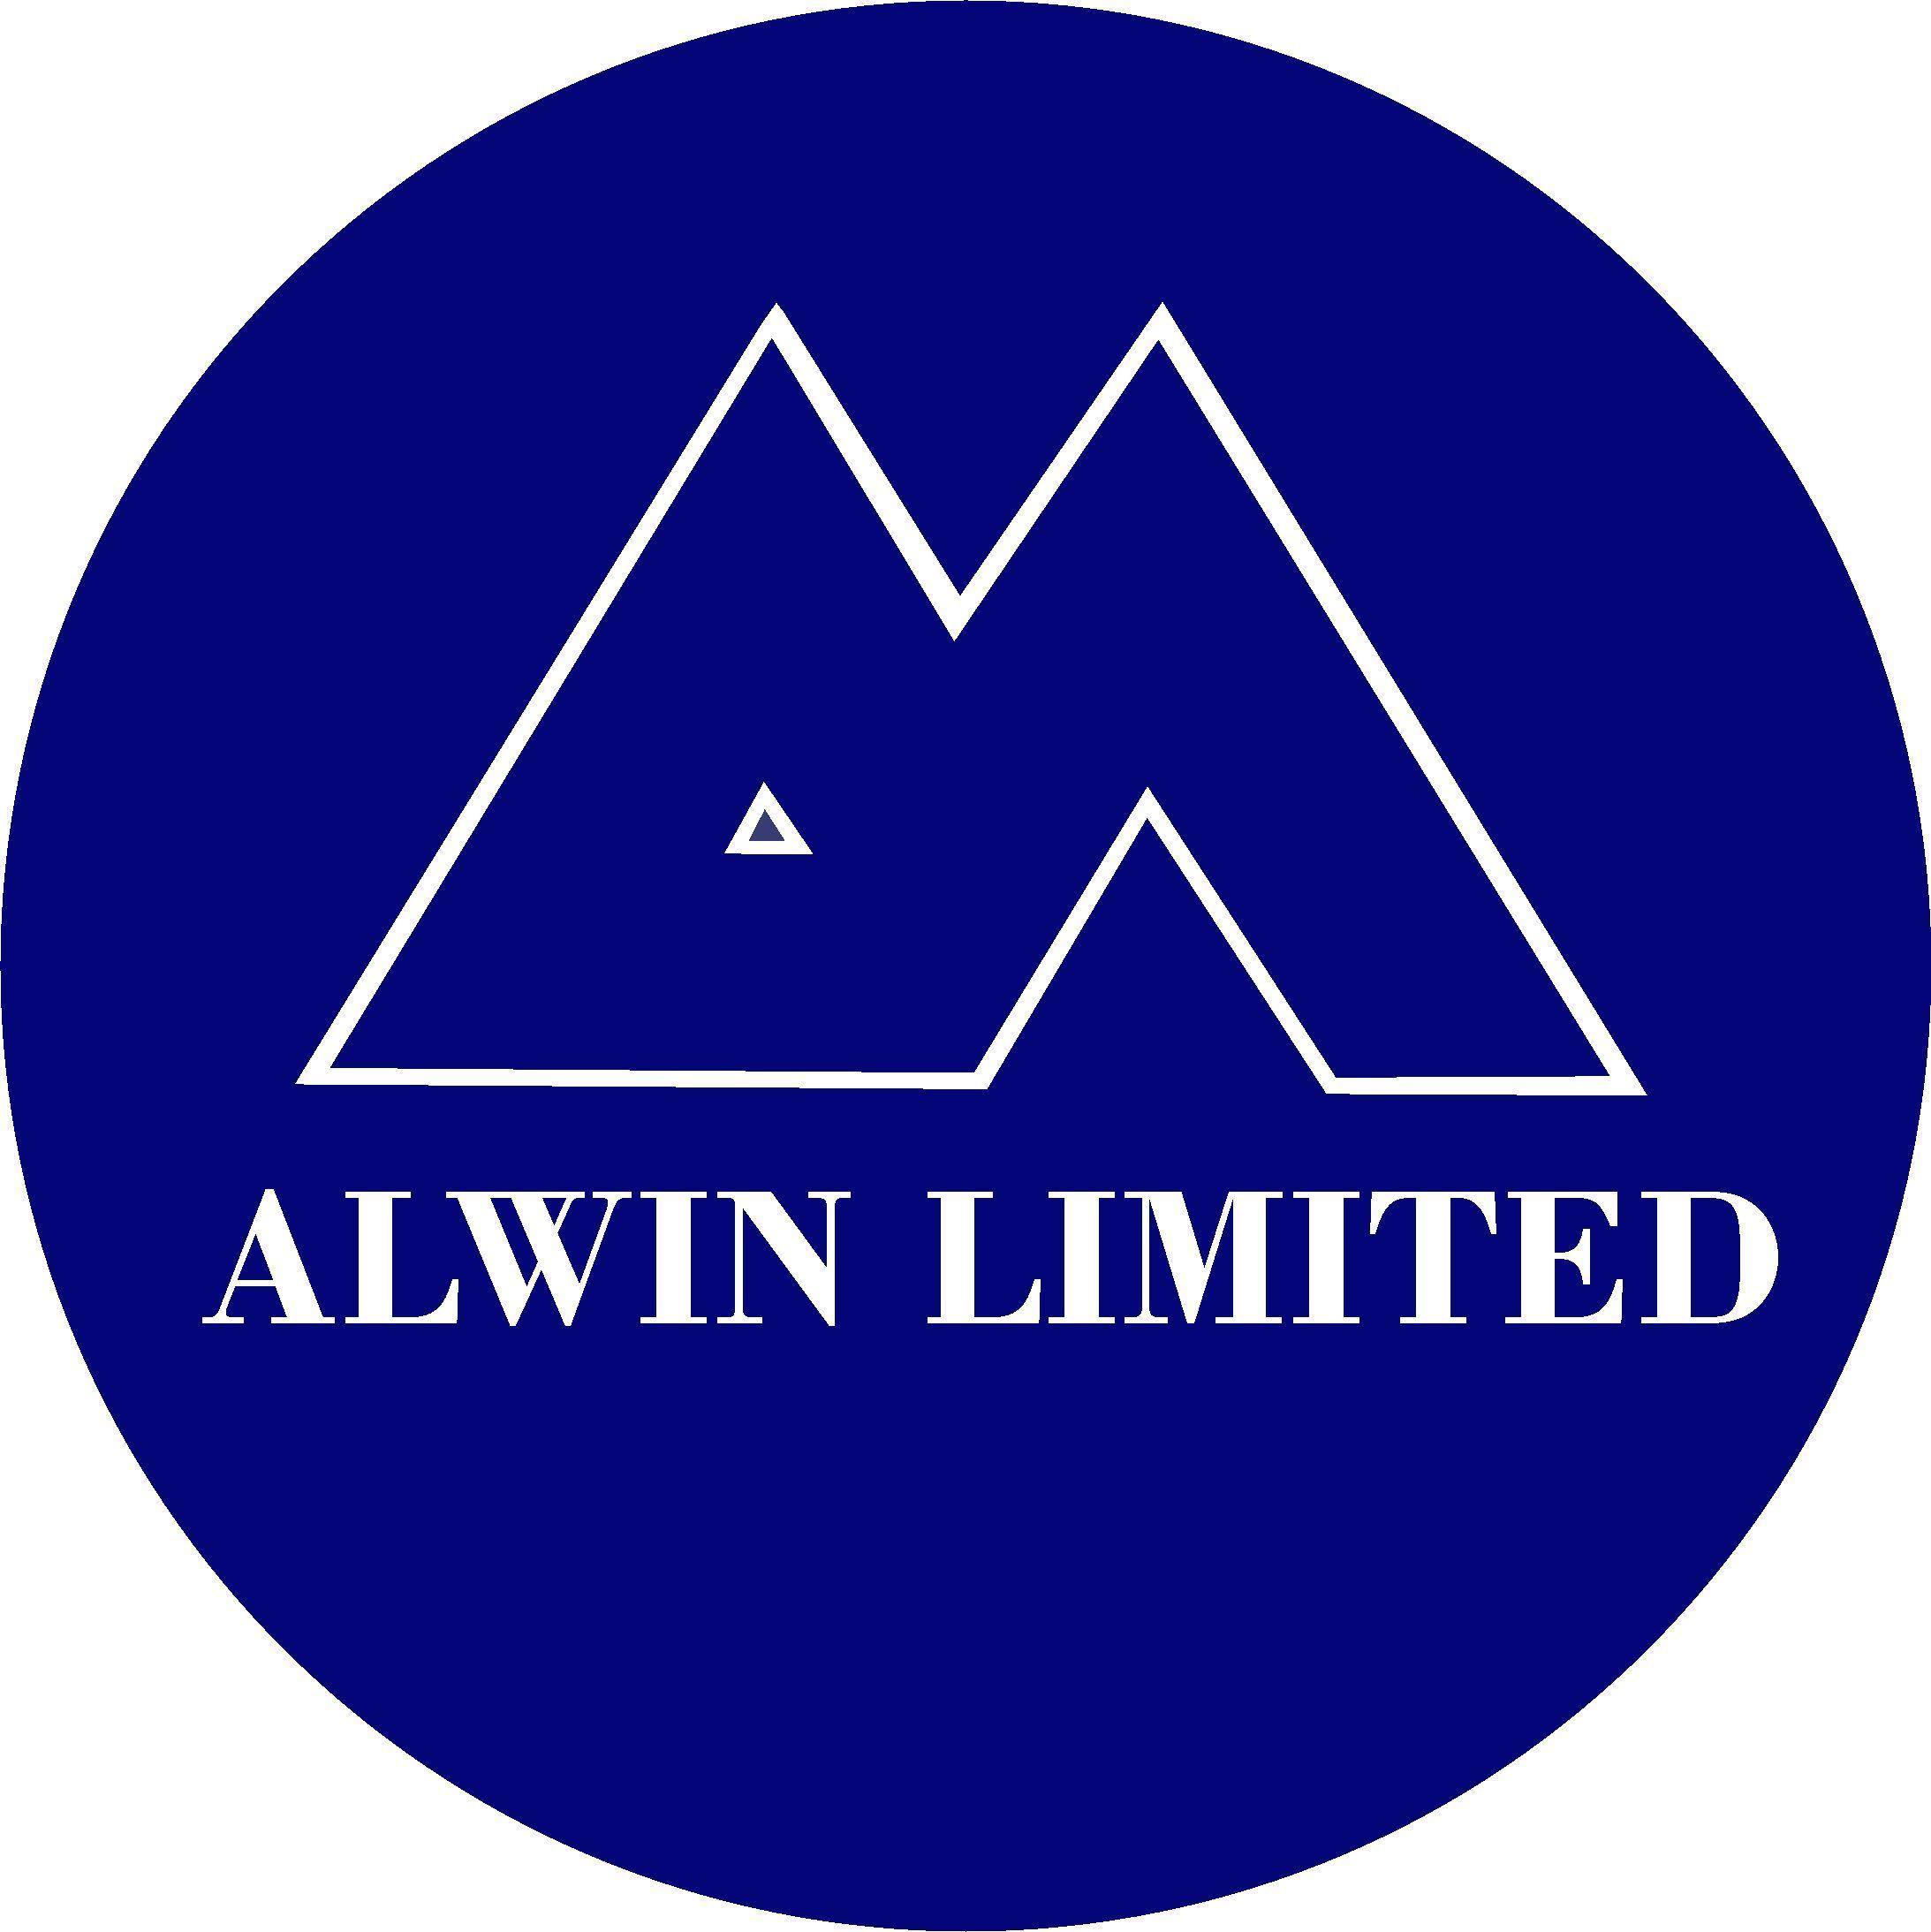 Haley Stilwell- Alwin Limited